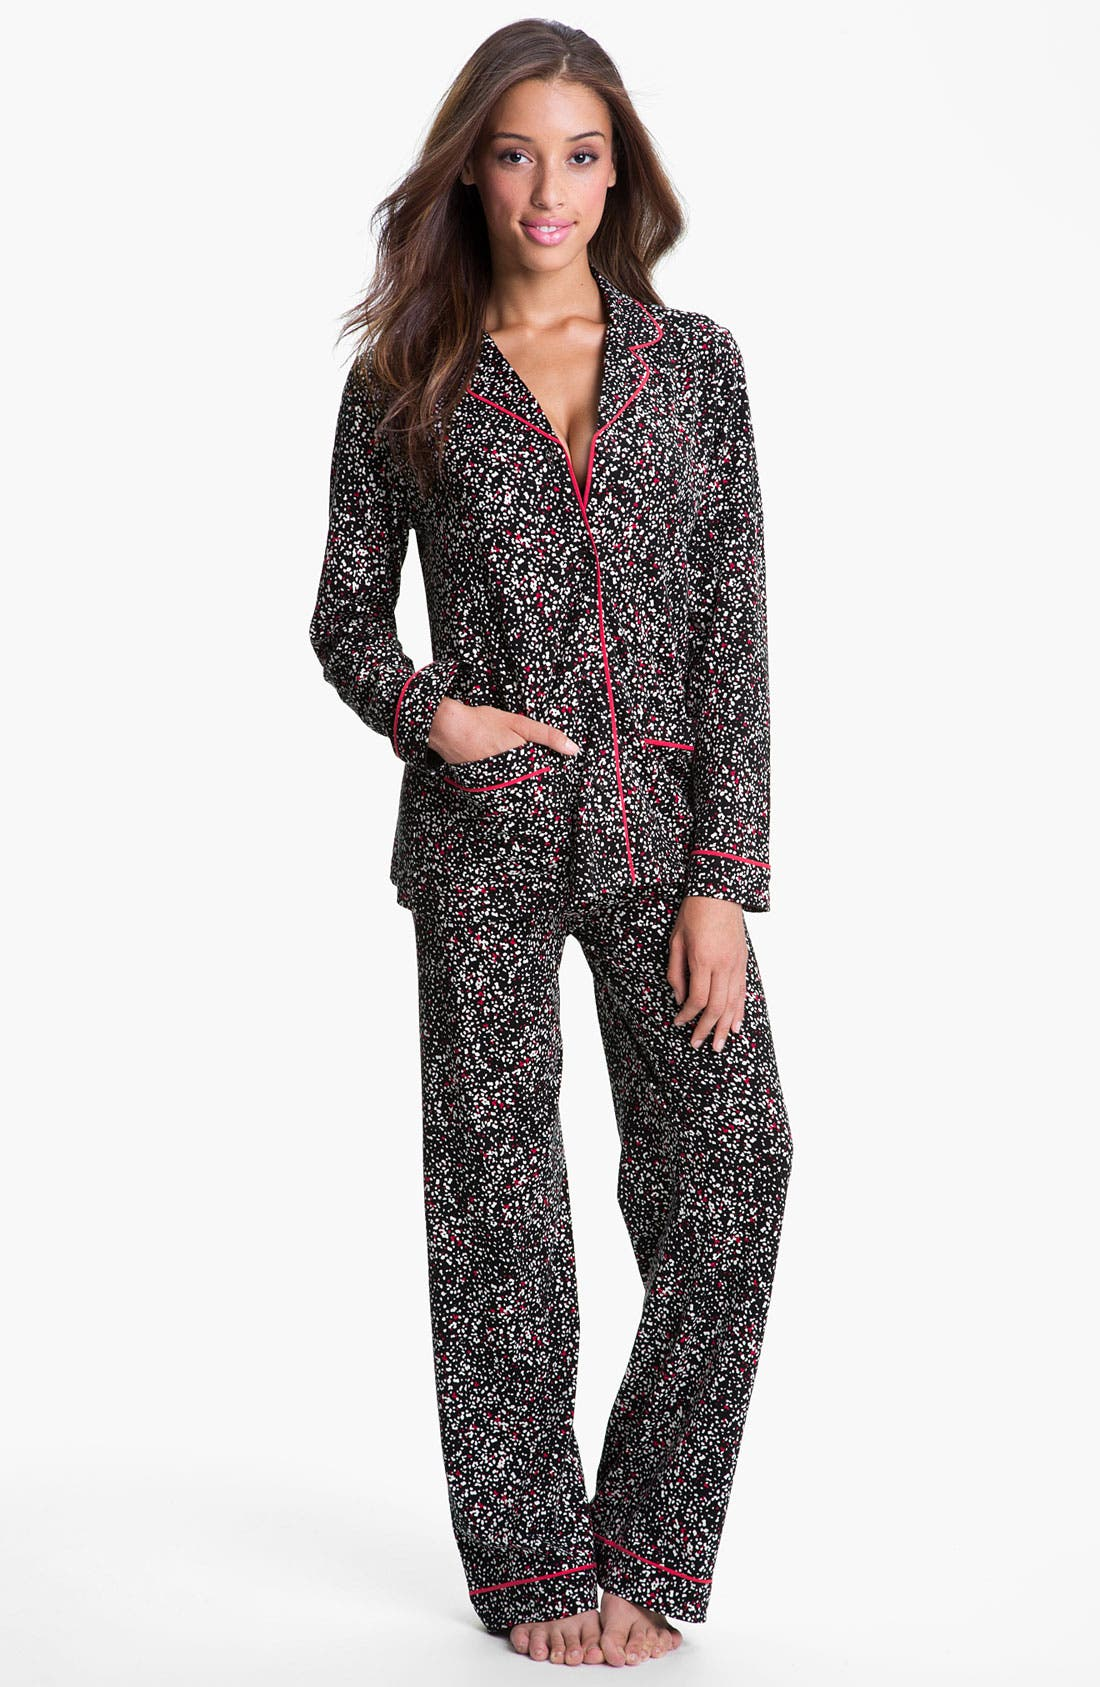 Main Image - DKNY Patterned Knit Pajamas